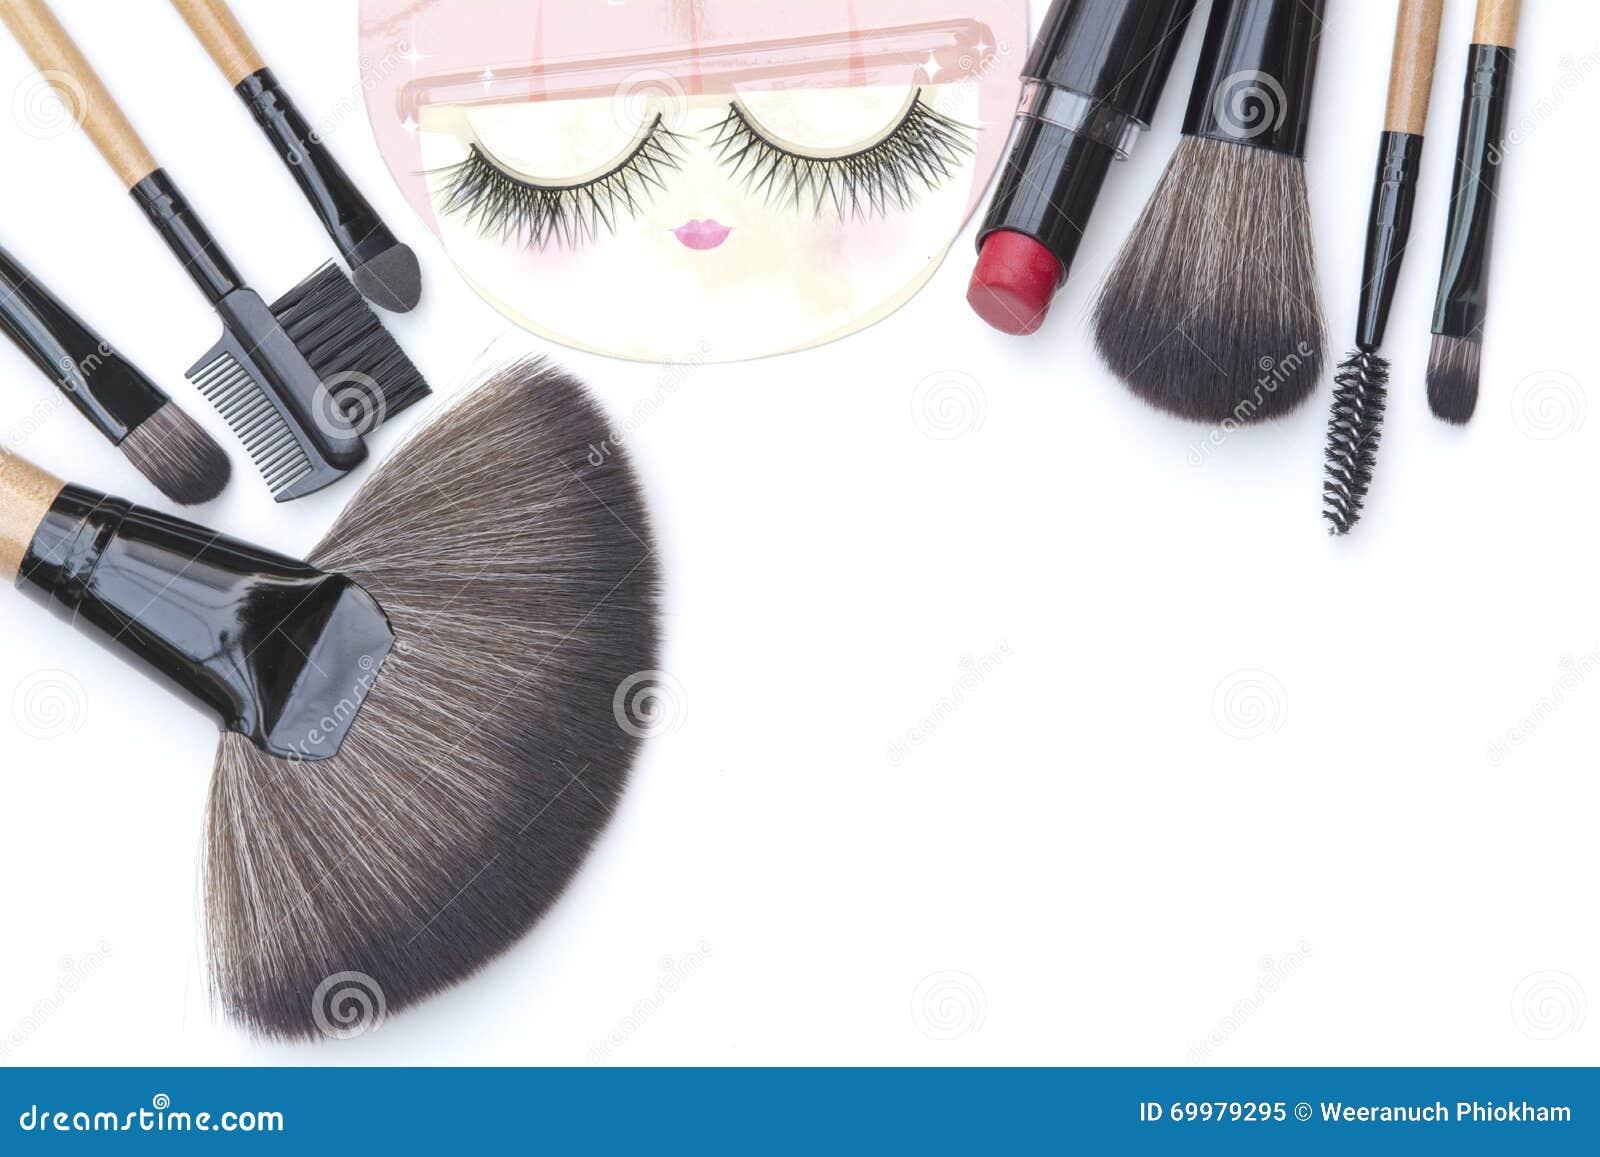 Isolated beautiful makeup brushes ,eyelash and red lipstick backgrounds